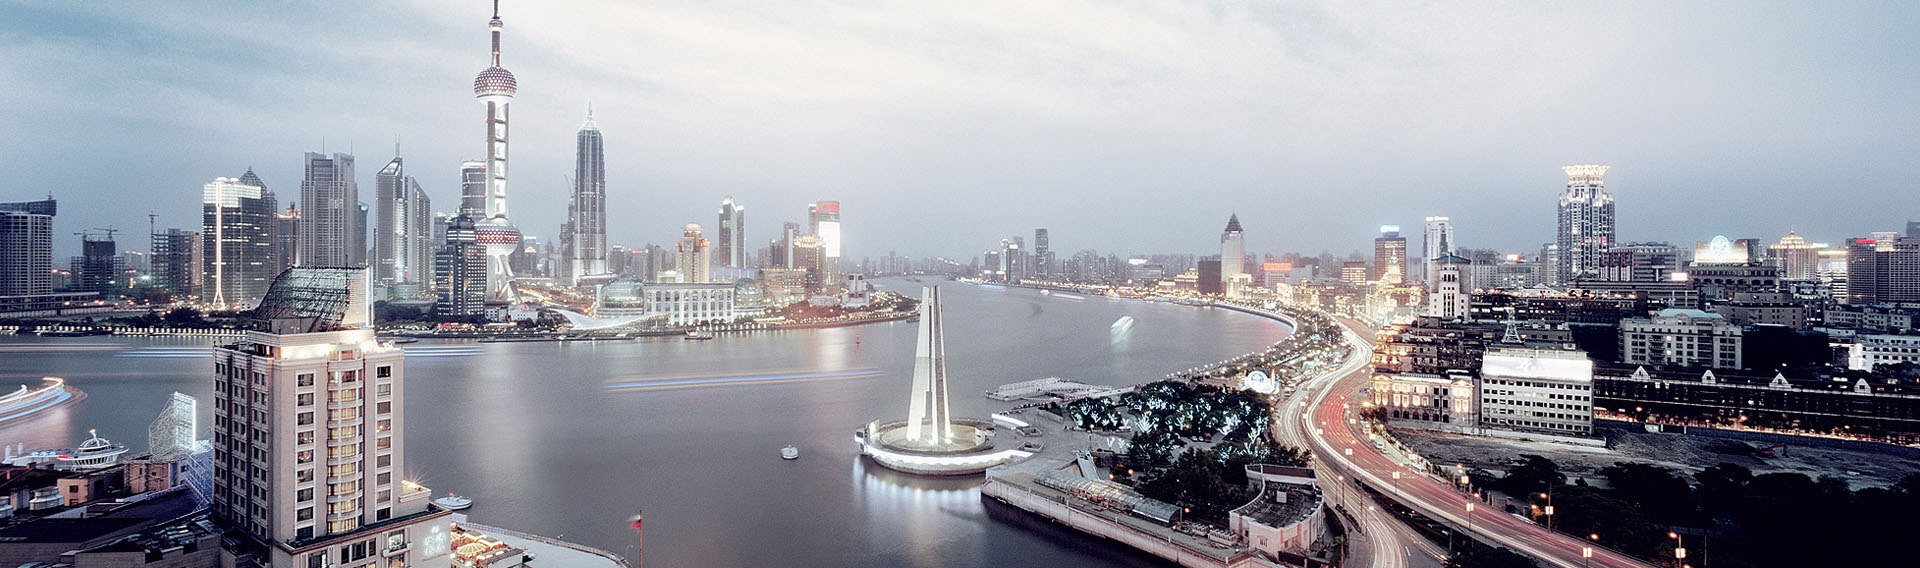 shanghai_skyline-HD